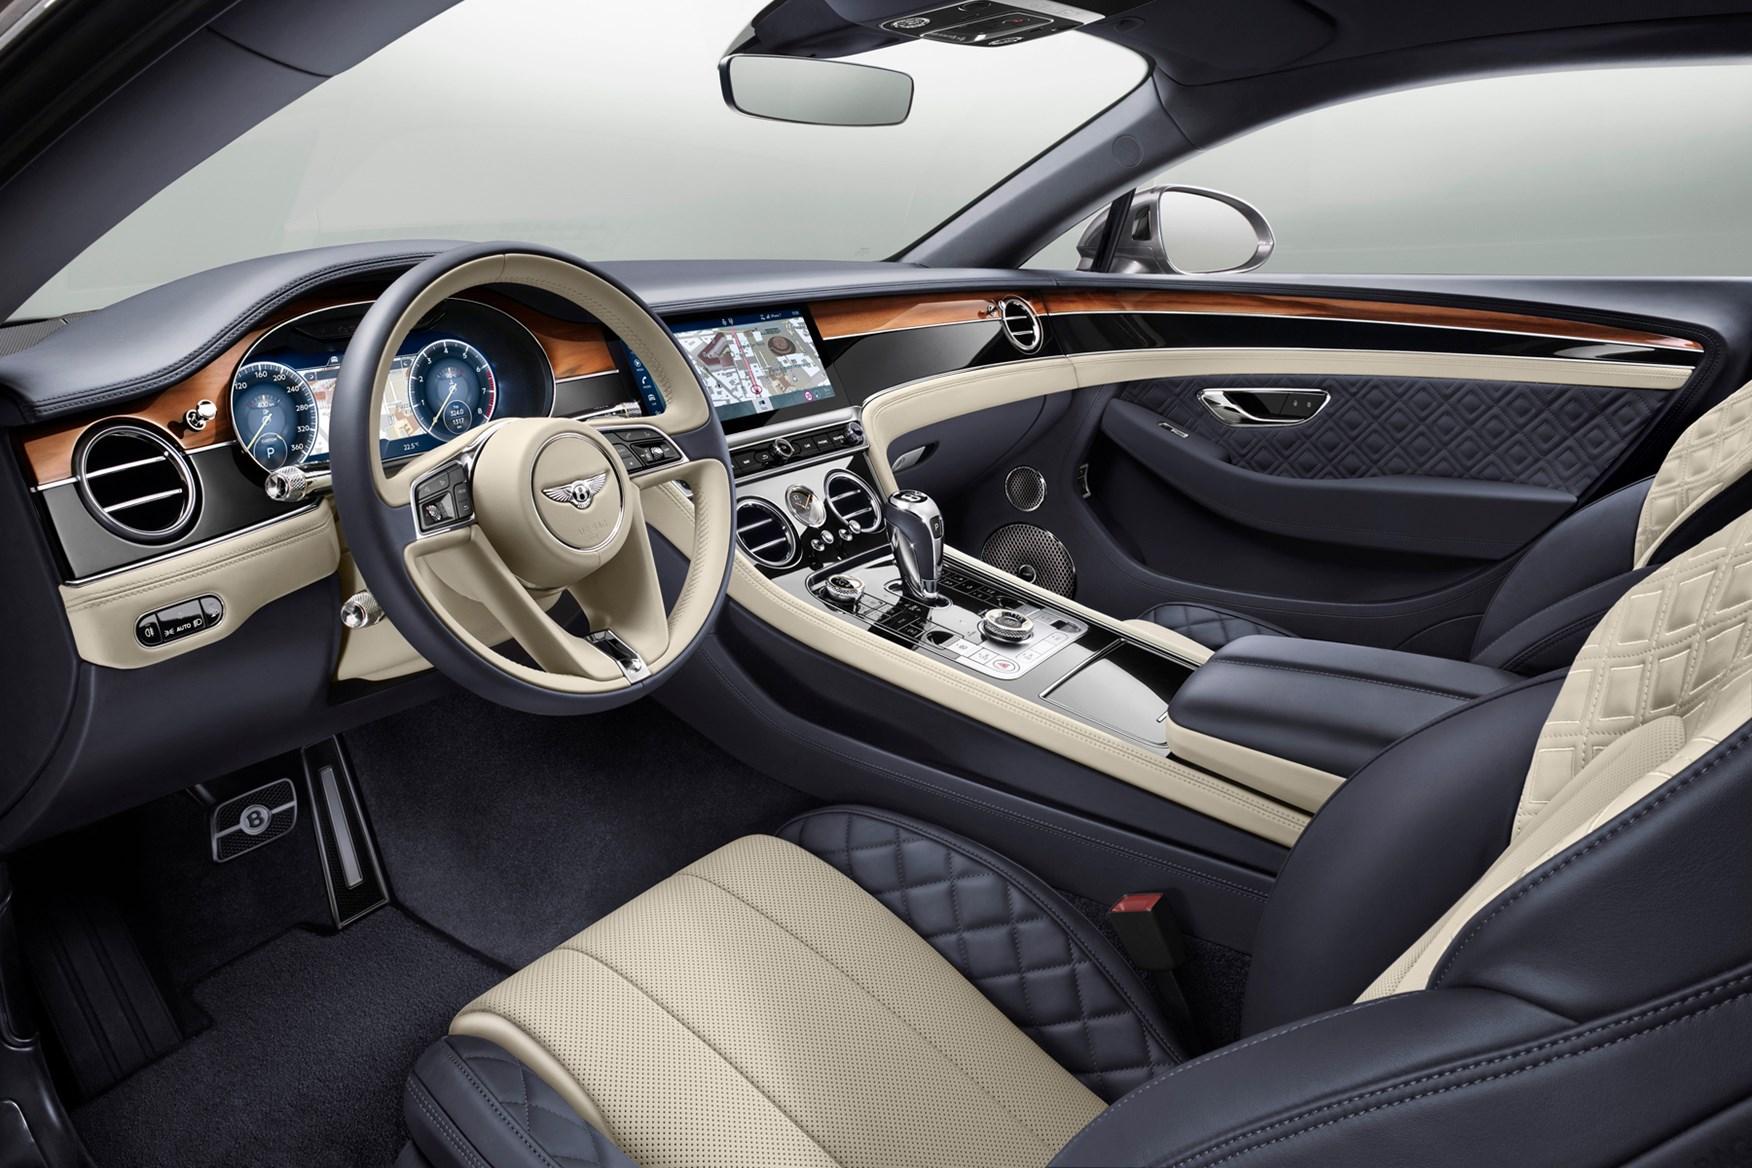 Bentley Continental GT cabin